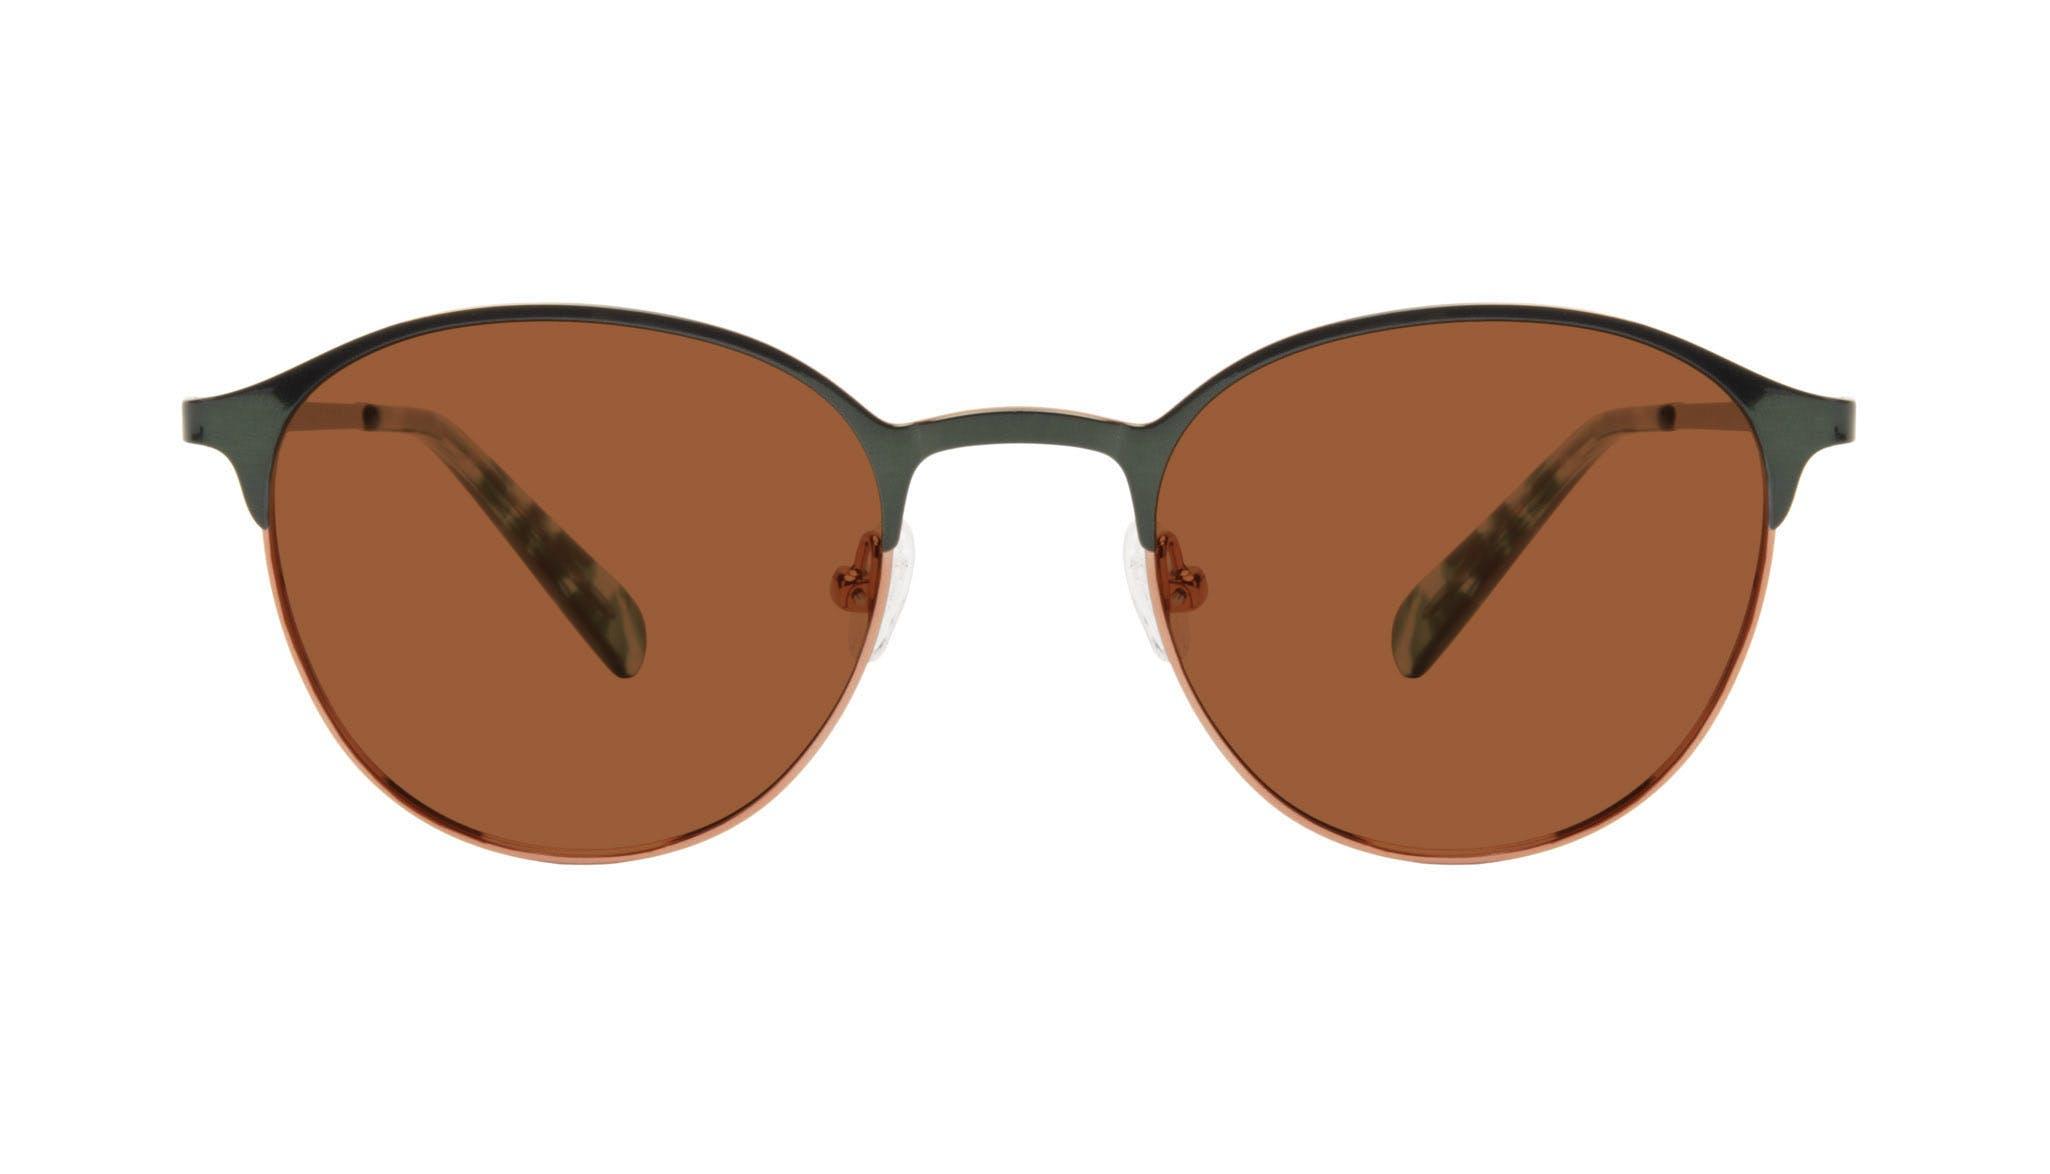 Affordable Fashion Glasses Round Eyeglasses Women Bay II Emeraude